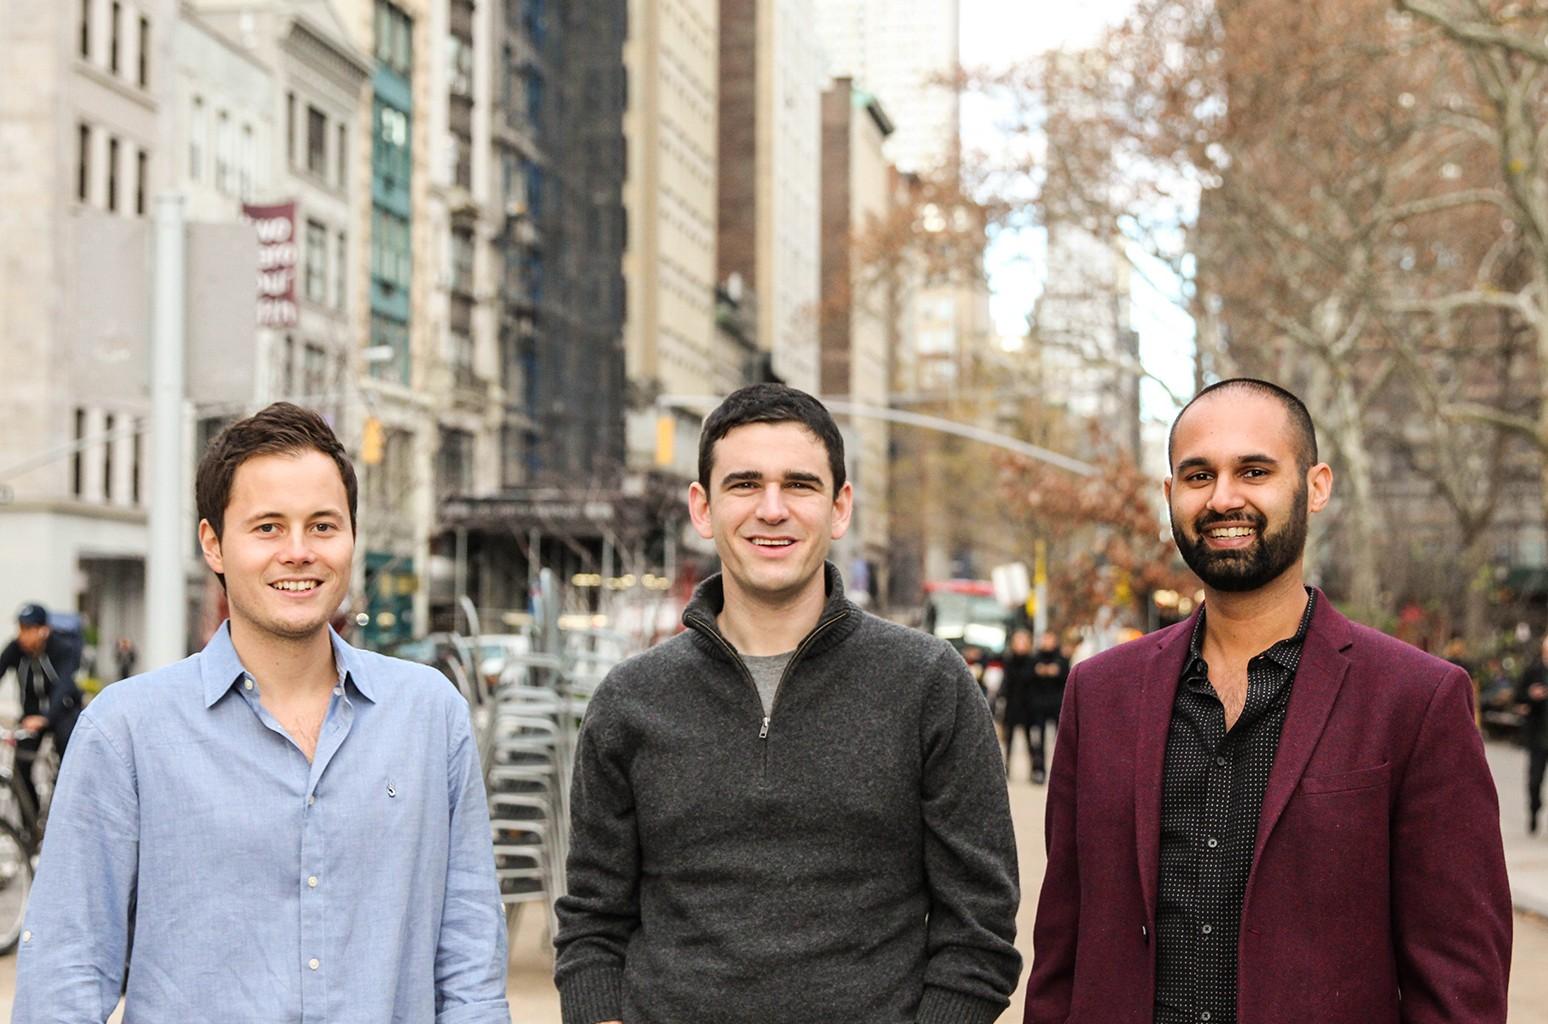 SeatGeek Co-Founders Eric Waller, Jack Groetzinger, Russ D'Souza